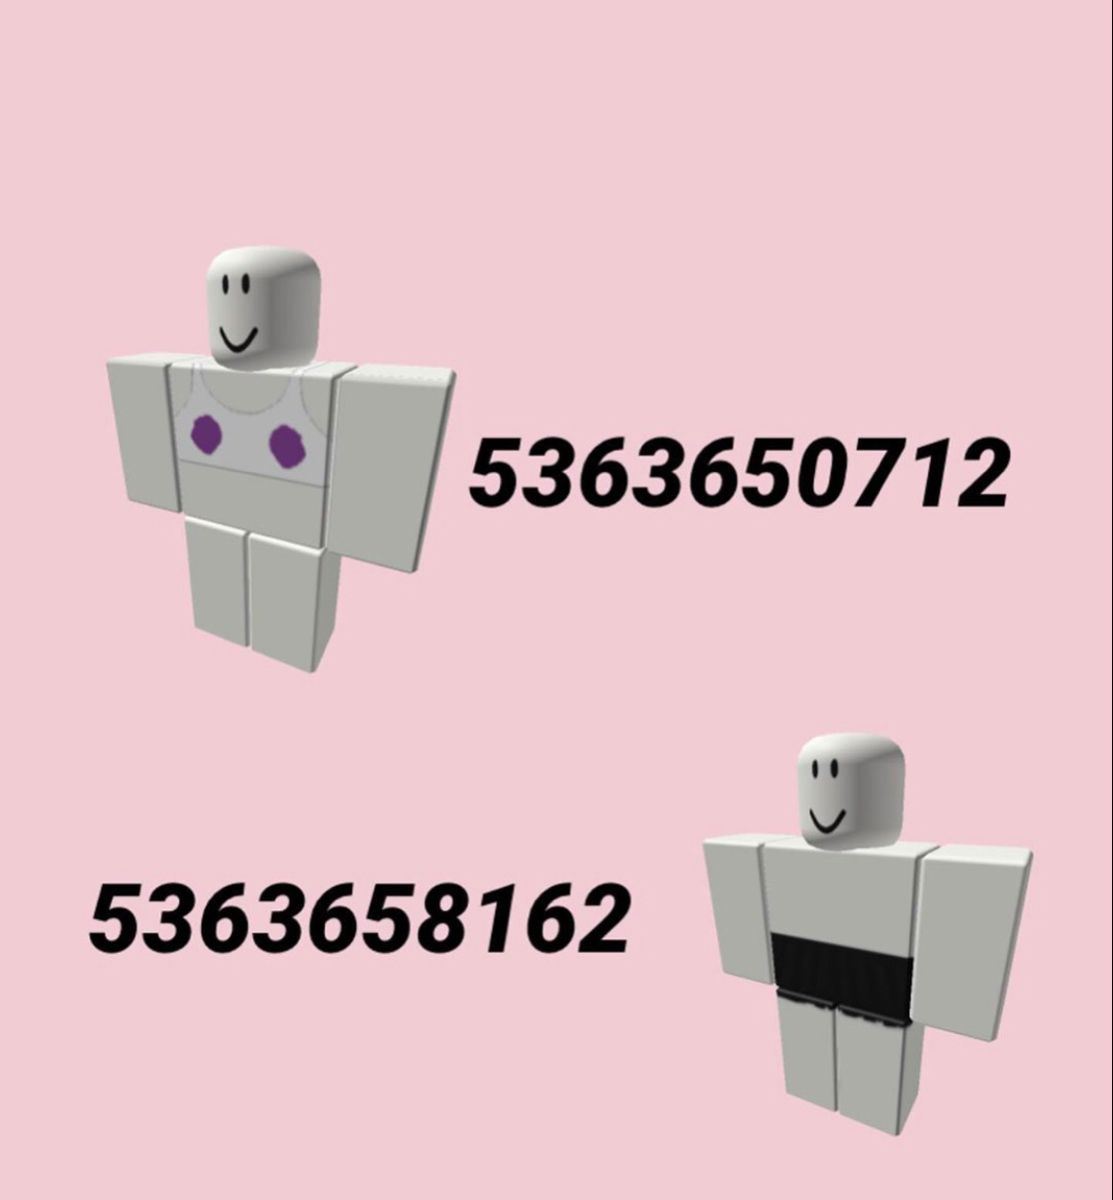 Not Mine Roblox Codes Coding Clothes Roblox [ 1200 x 1113 Pixel ]